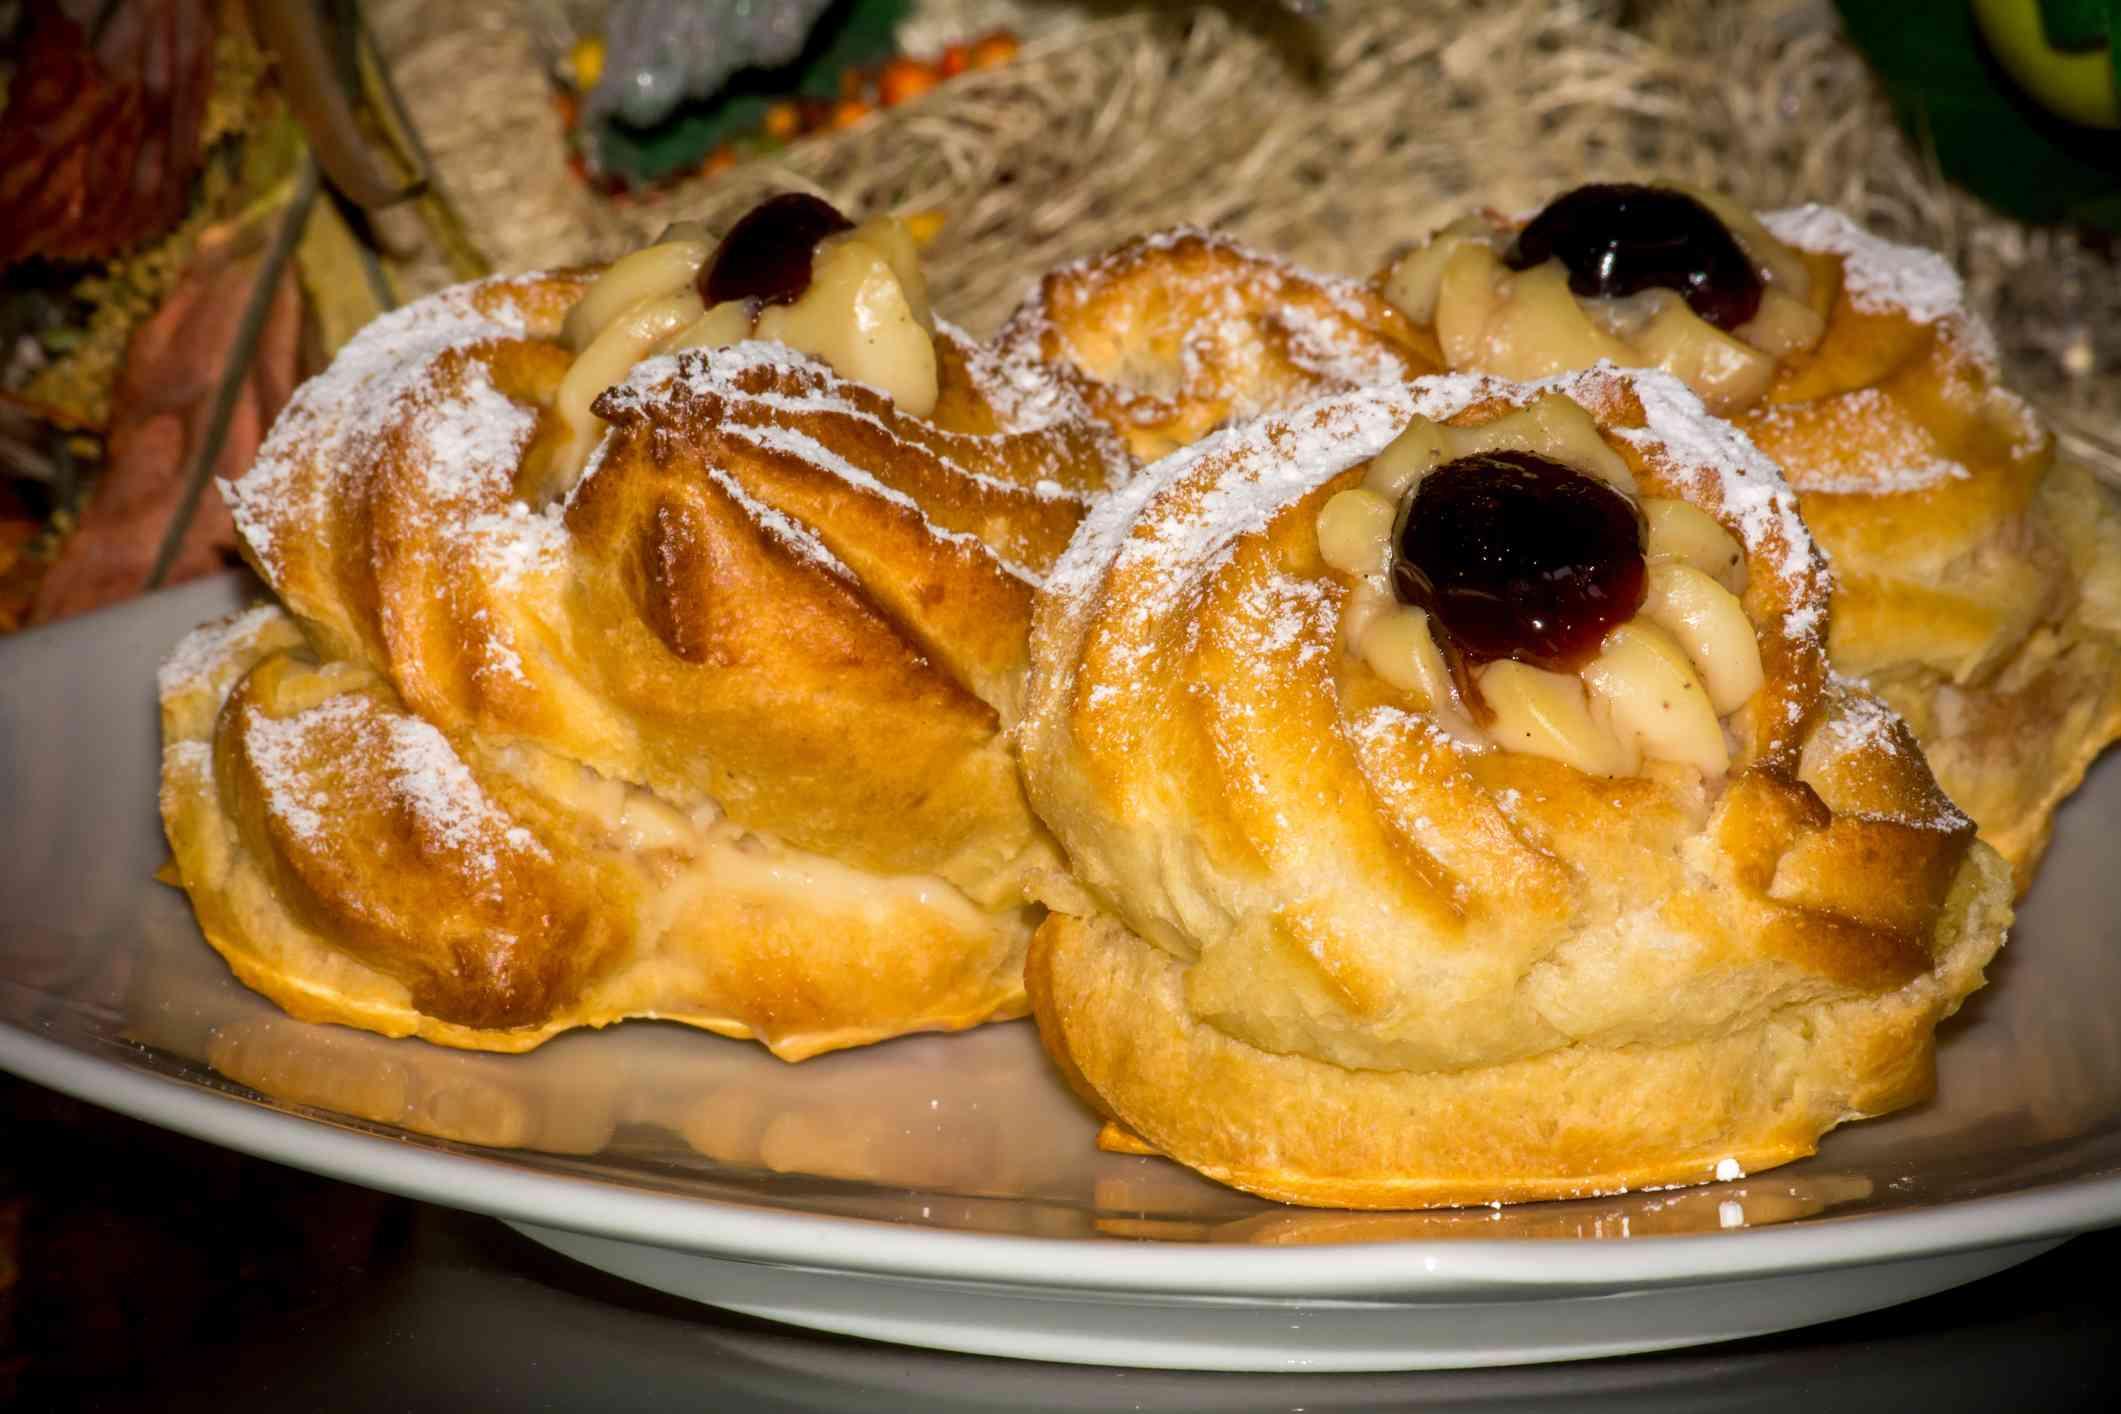 Traditional Baked Italian Food Called Zeppole during Saint Joseph Celebration (Festa de San Giuseppe